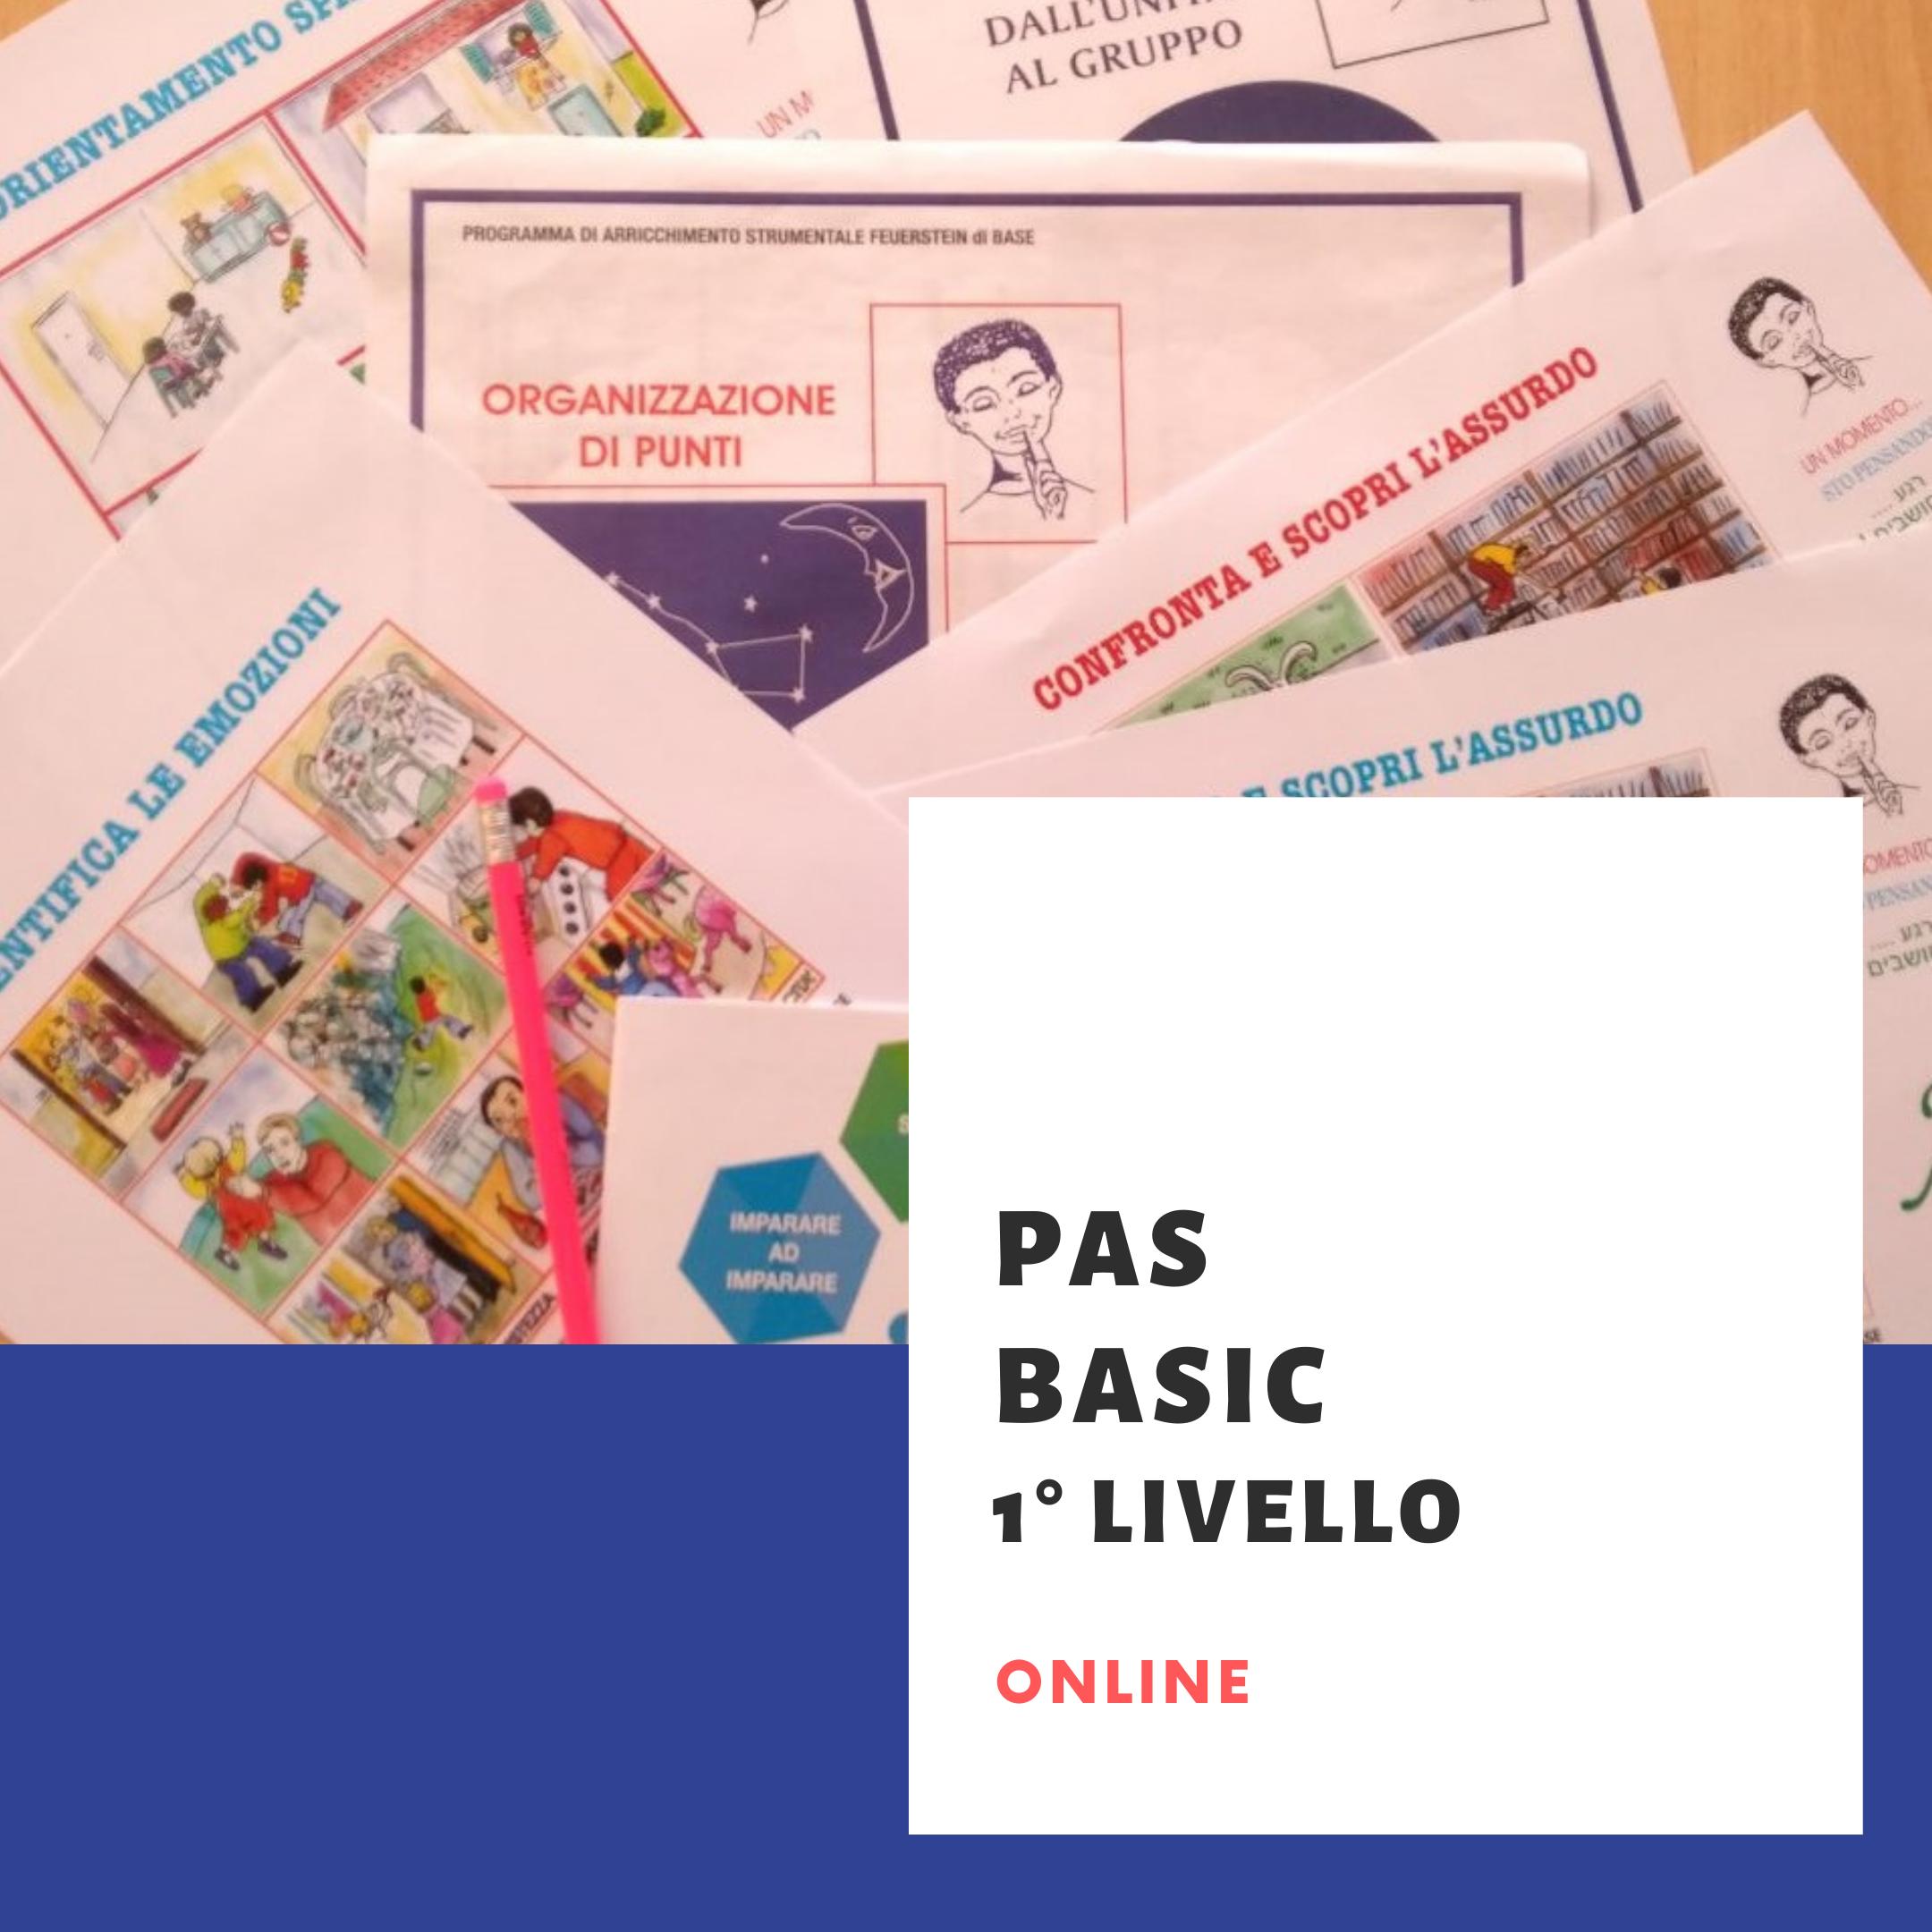 PAS BASIC 1° livello online - novembre